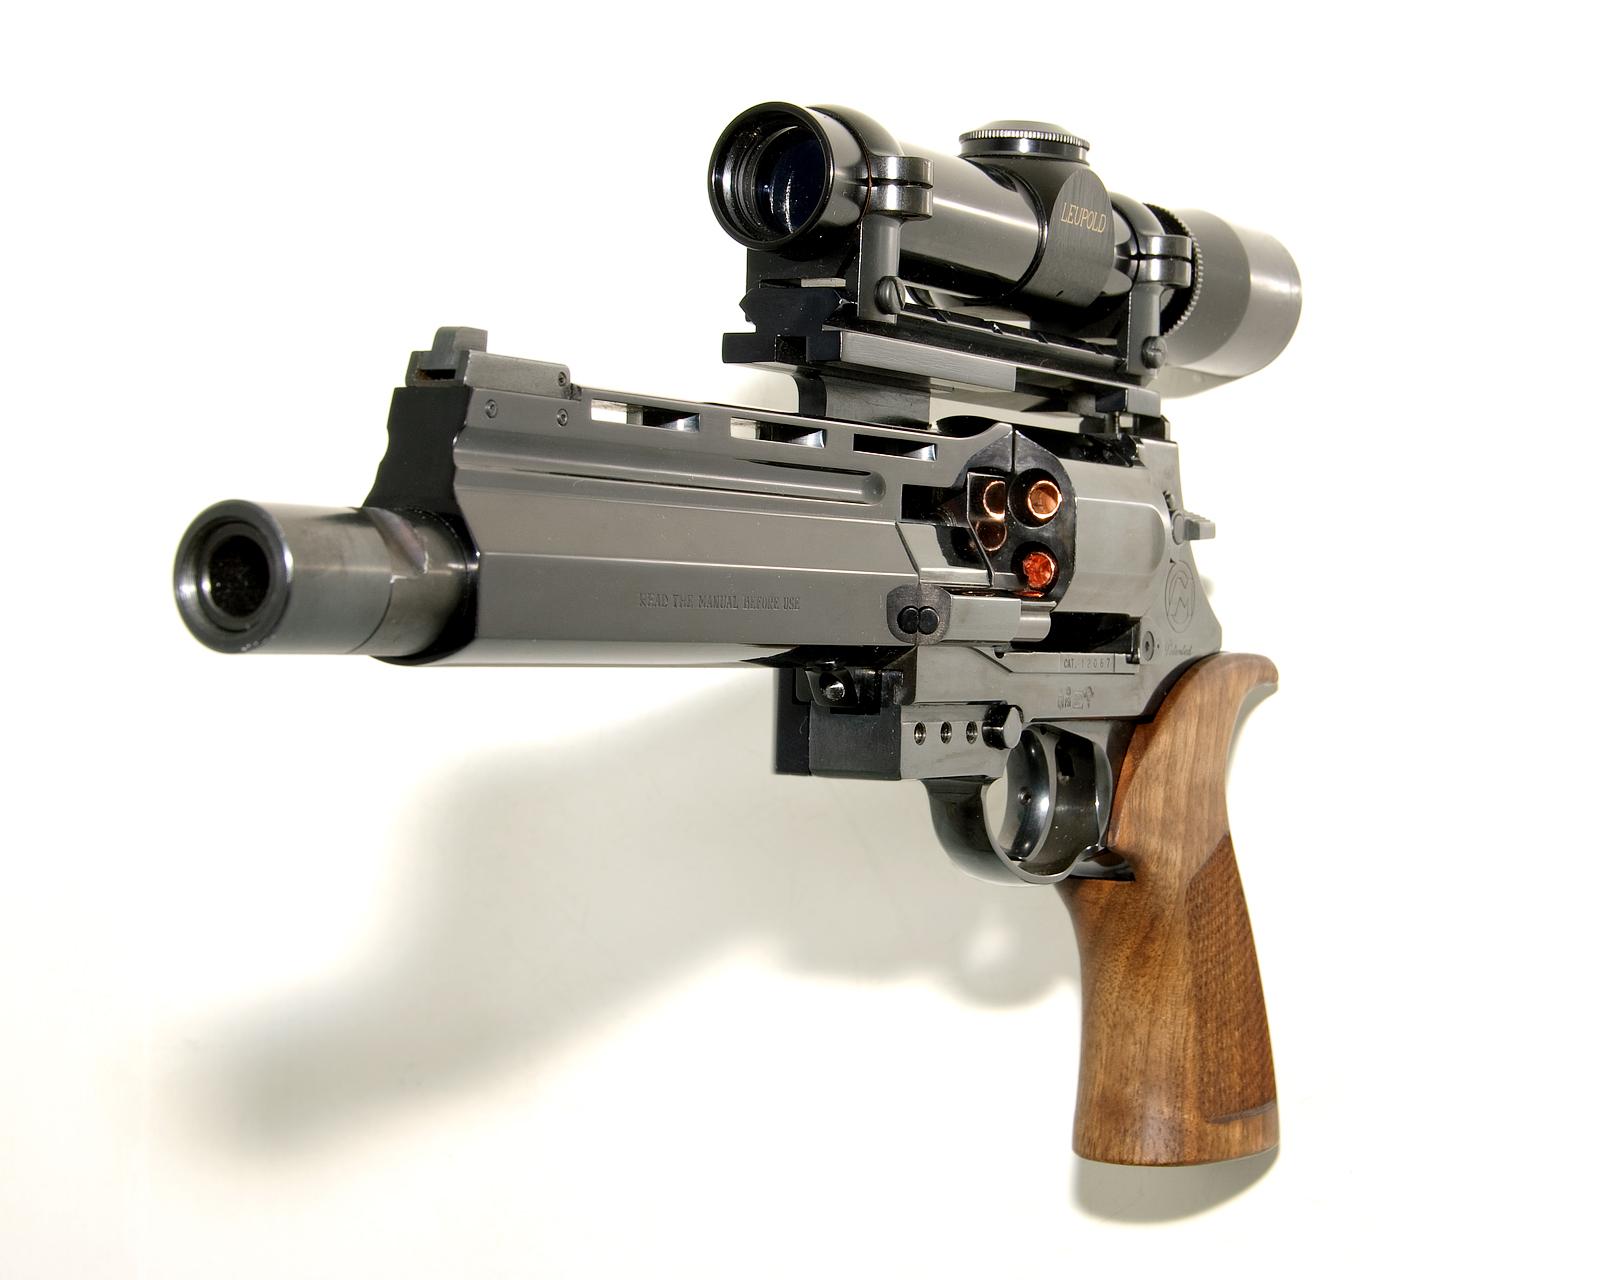 Wallpaper Cyberpunk Anime Futuristic Steampunk Nikon Pistol Assault Rifle Revolver Handgun Airsoft Italian Magnum Retro Automatic D80